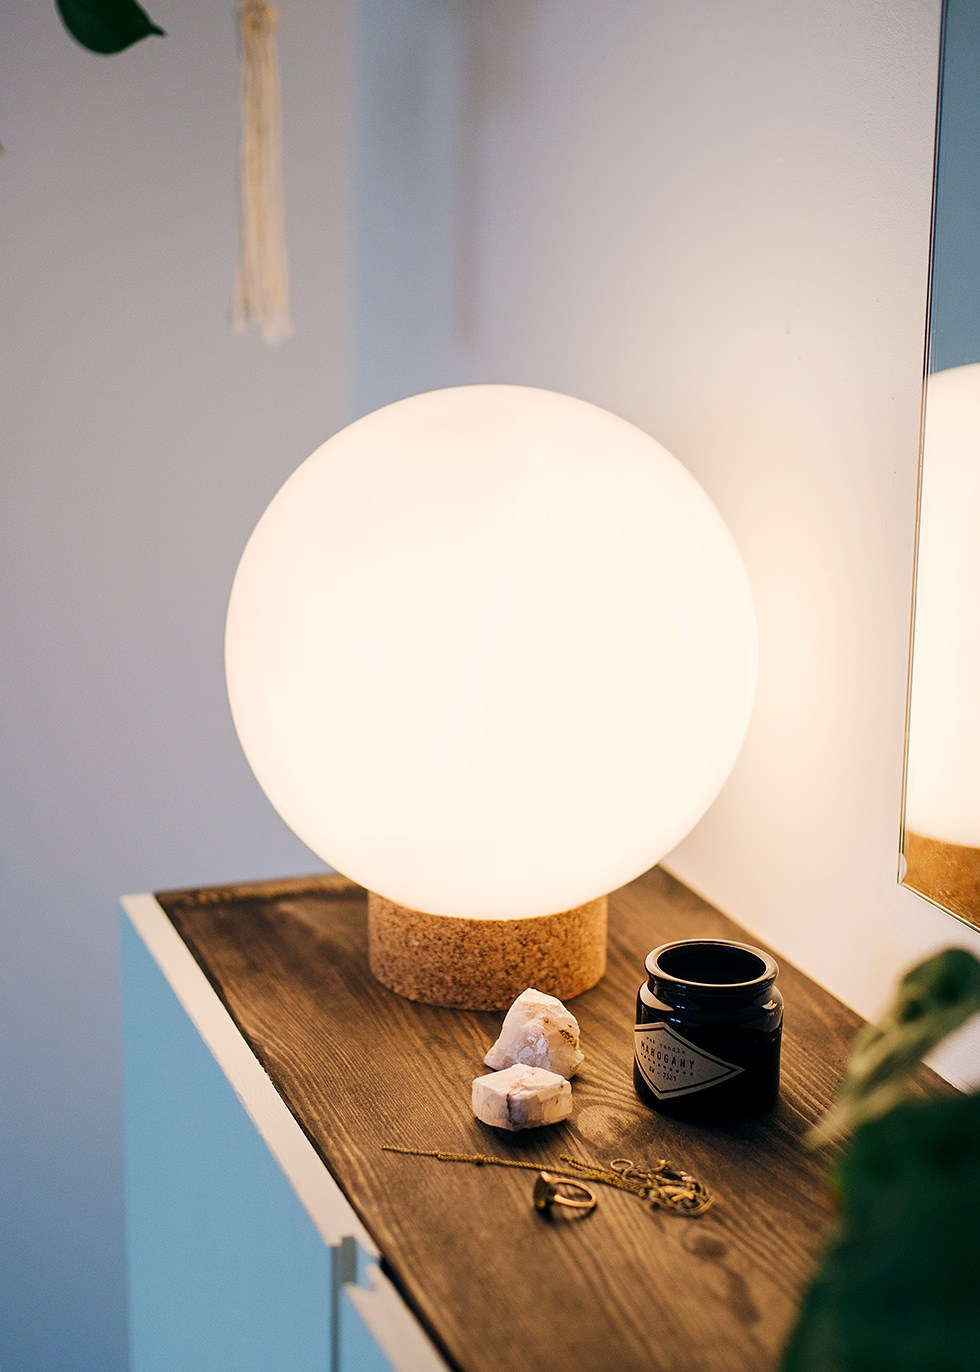 Round cork lamp DIY by Atilio